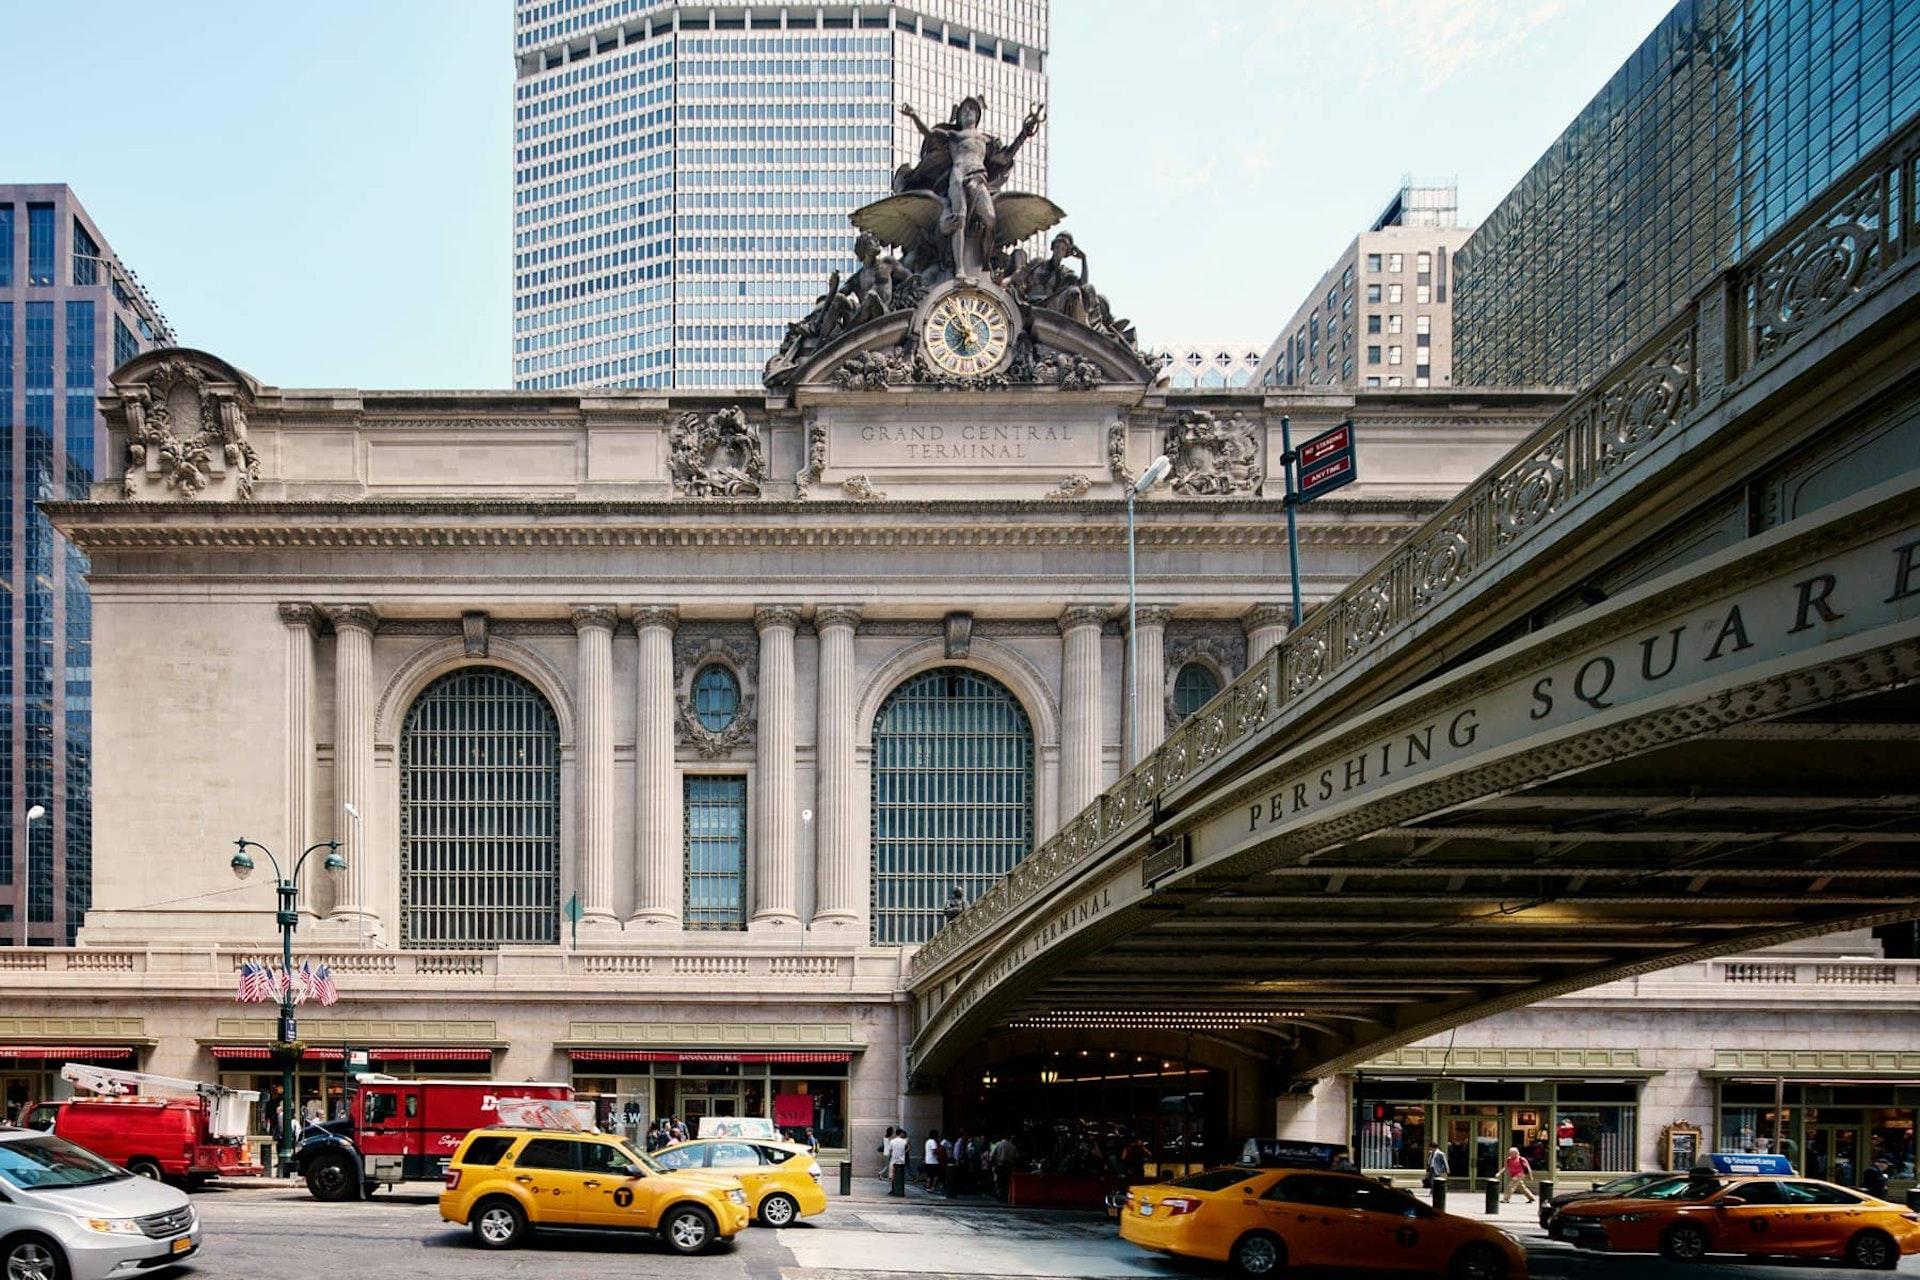 Exterior of Grand Central Terminal, New York